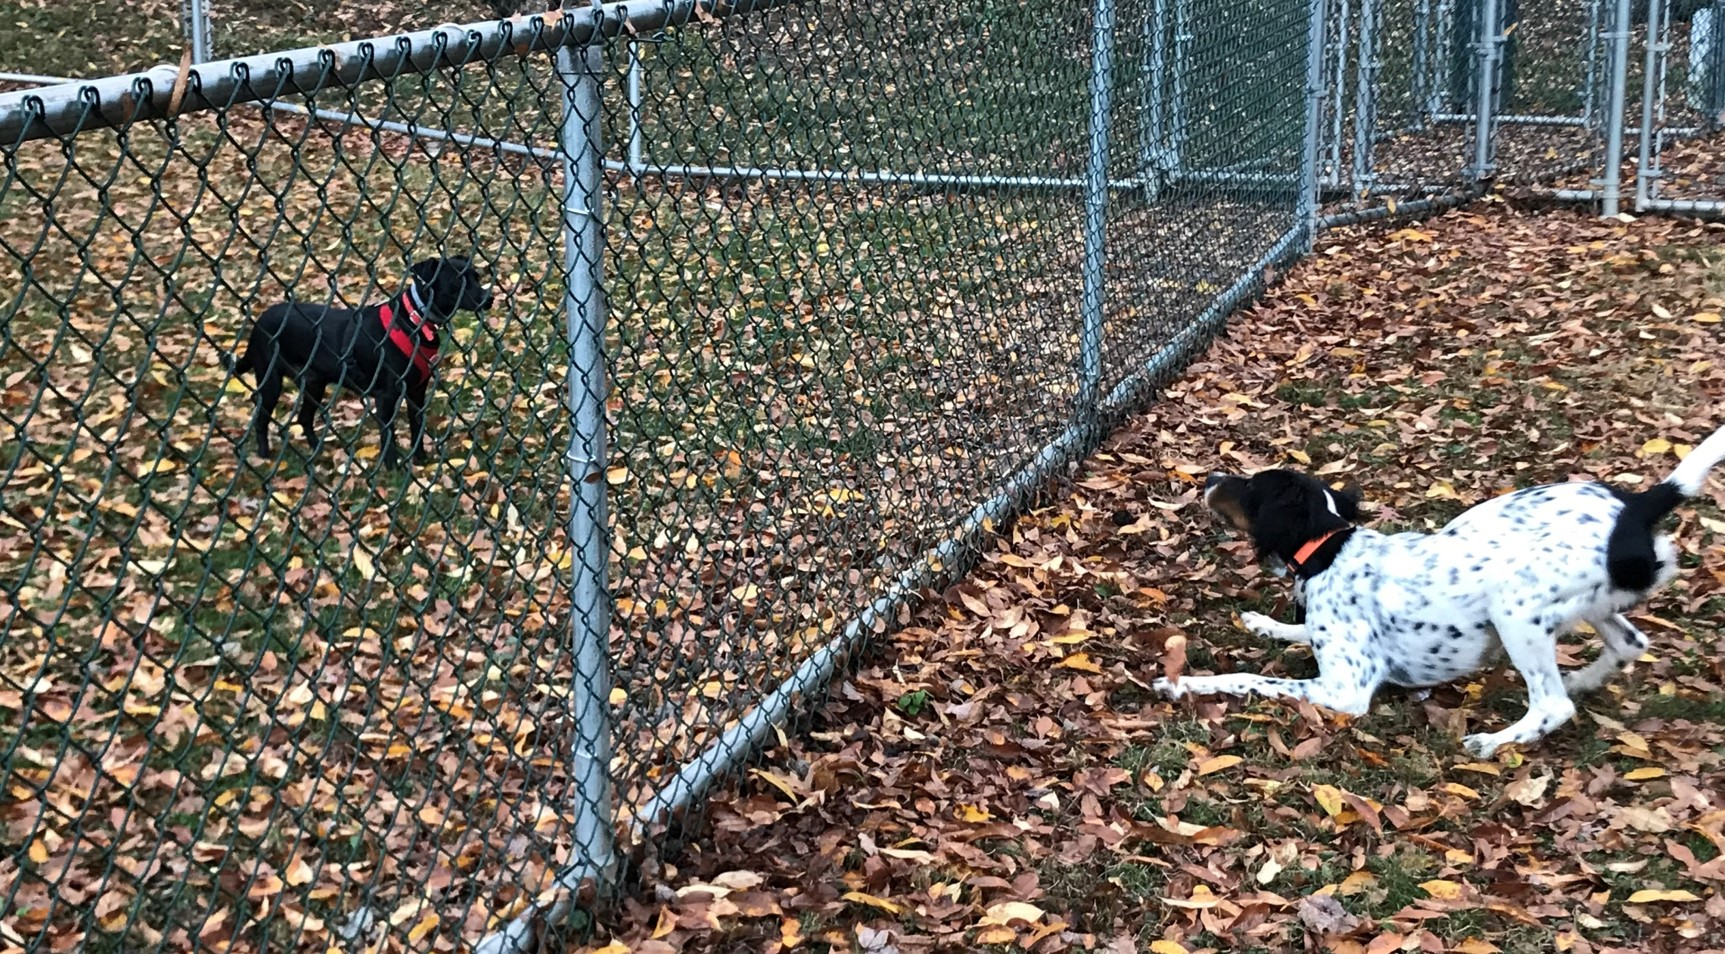 Canine Curiosity, Stark Dog Park, Shamokin Dam